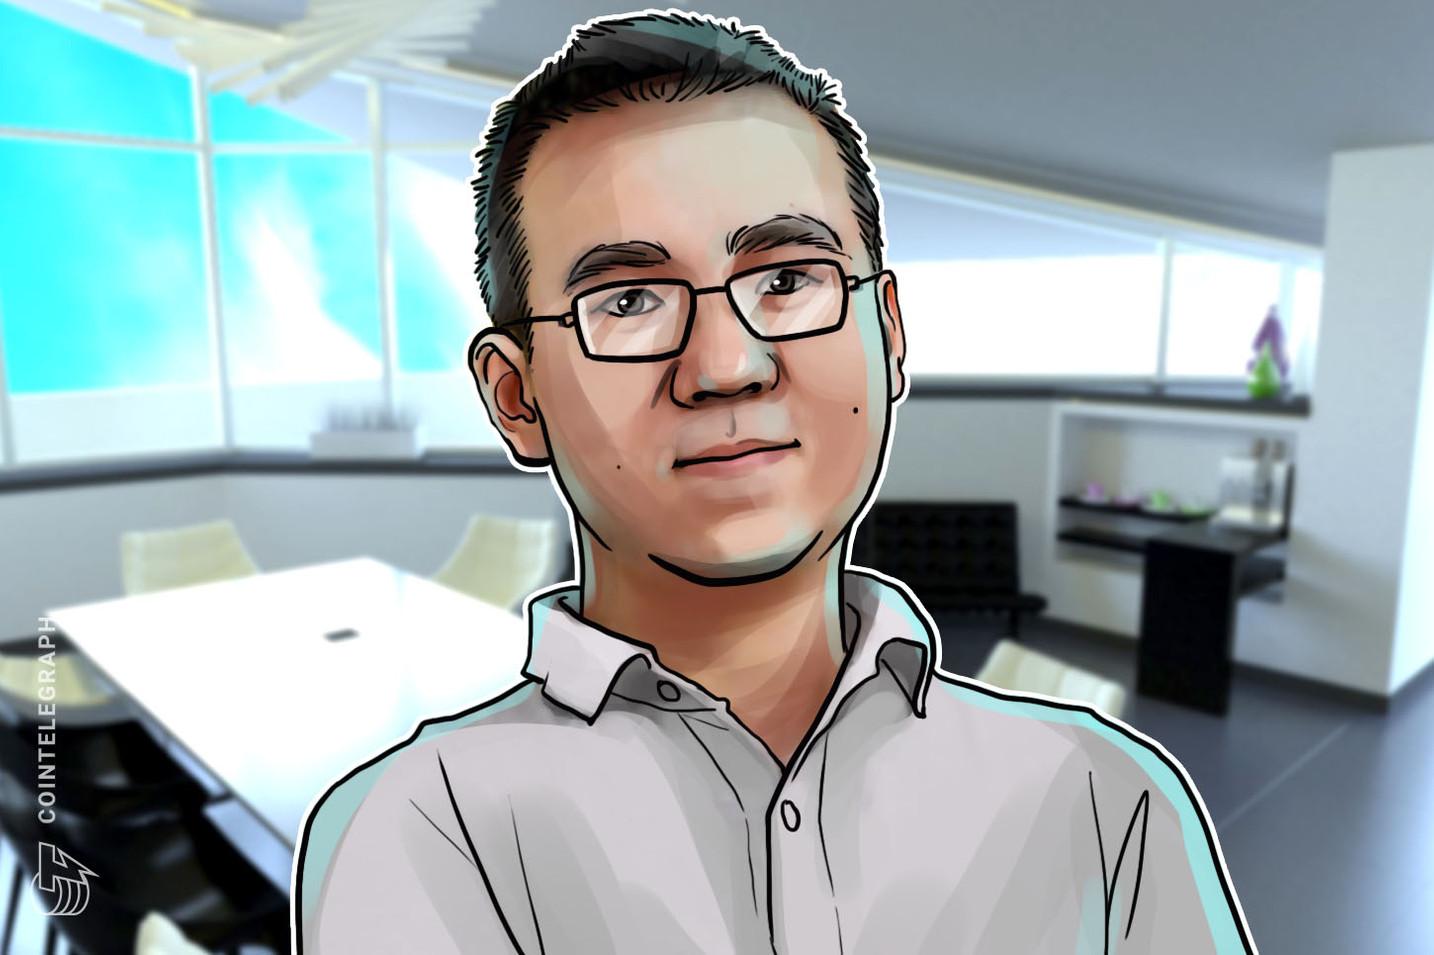 Former Bitmain CEO Jihan Wu raises fresh capital for new crypto unicorn